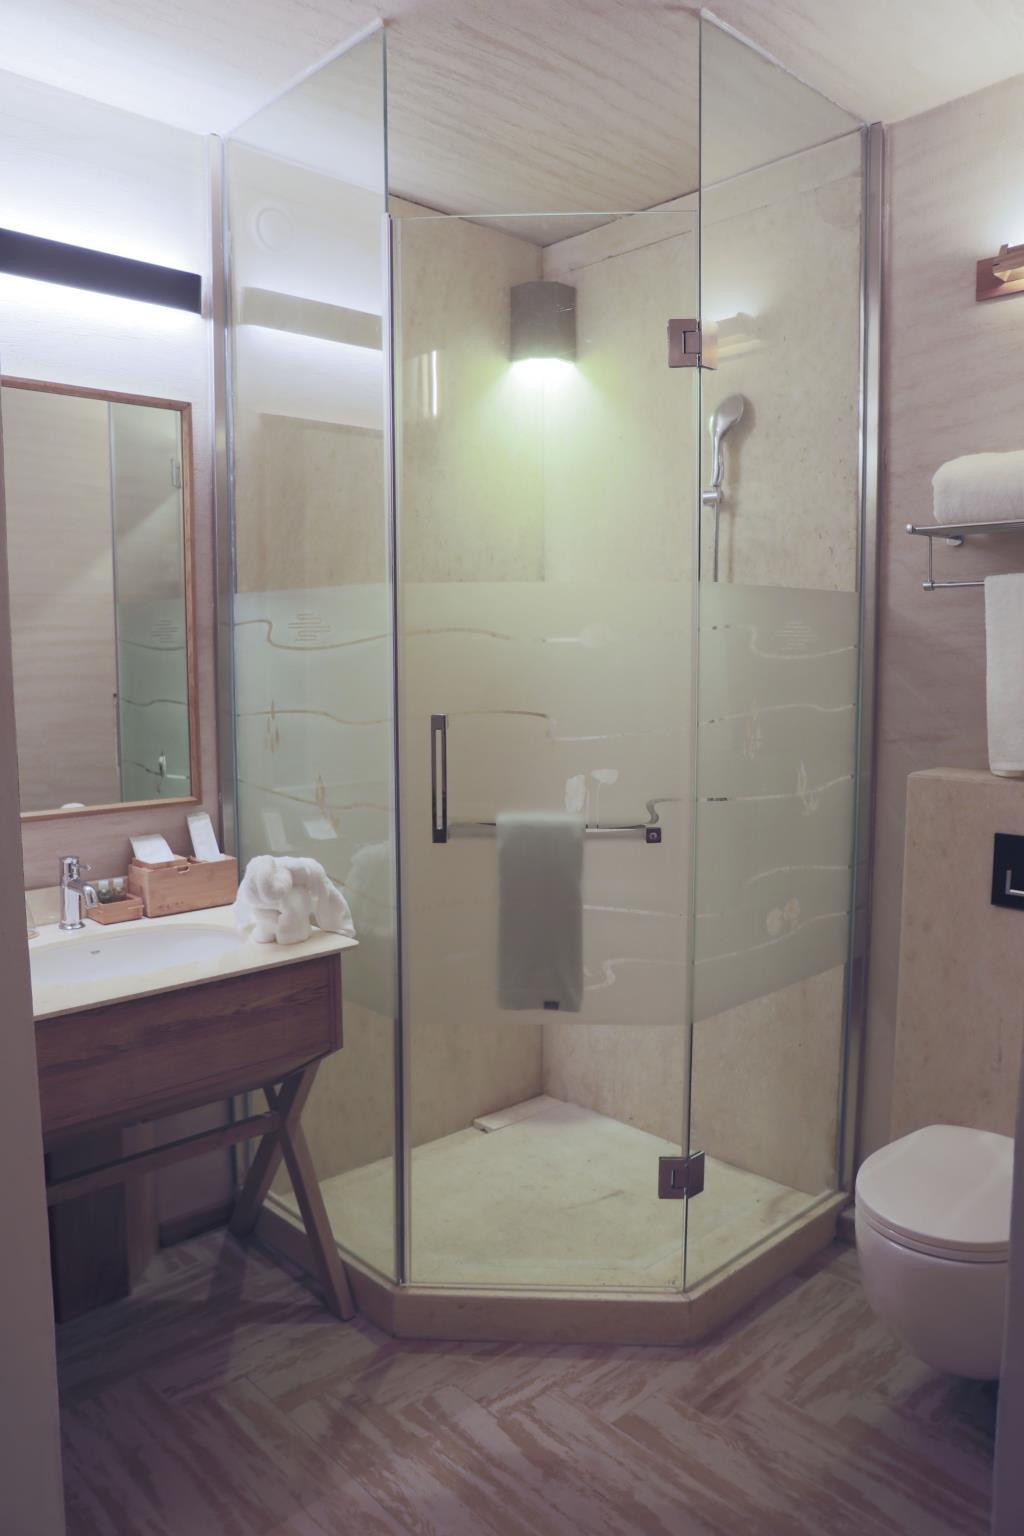 Cuncunli Life Aesthetics Hotel Pudong Airport Branch, Shanghai